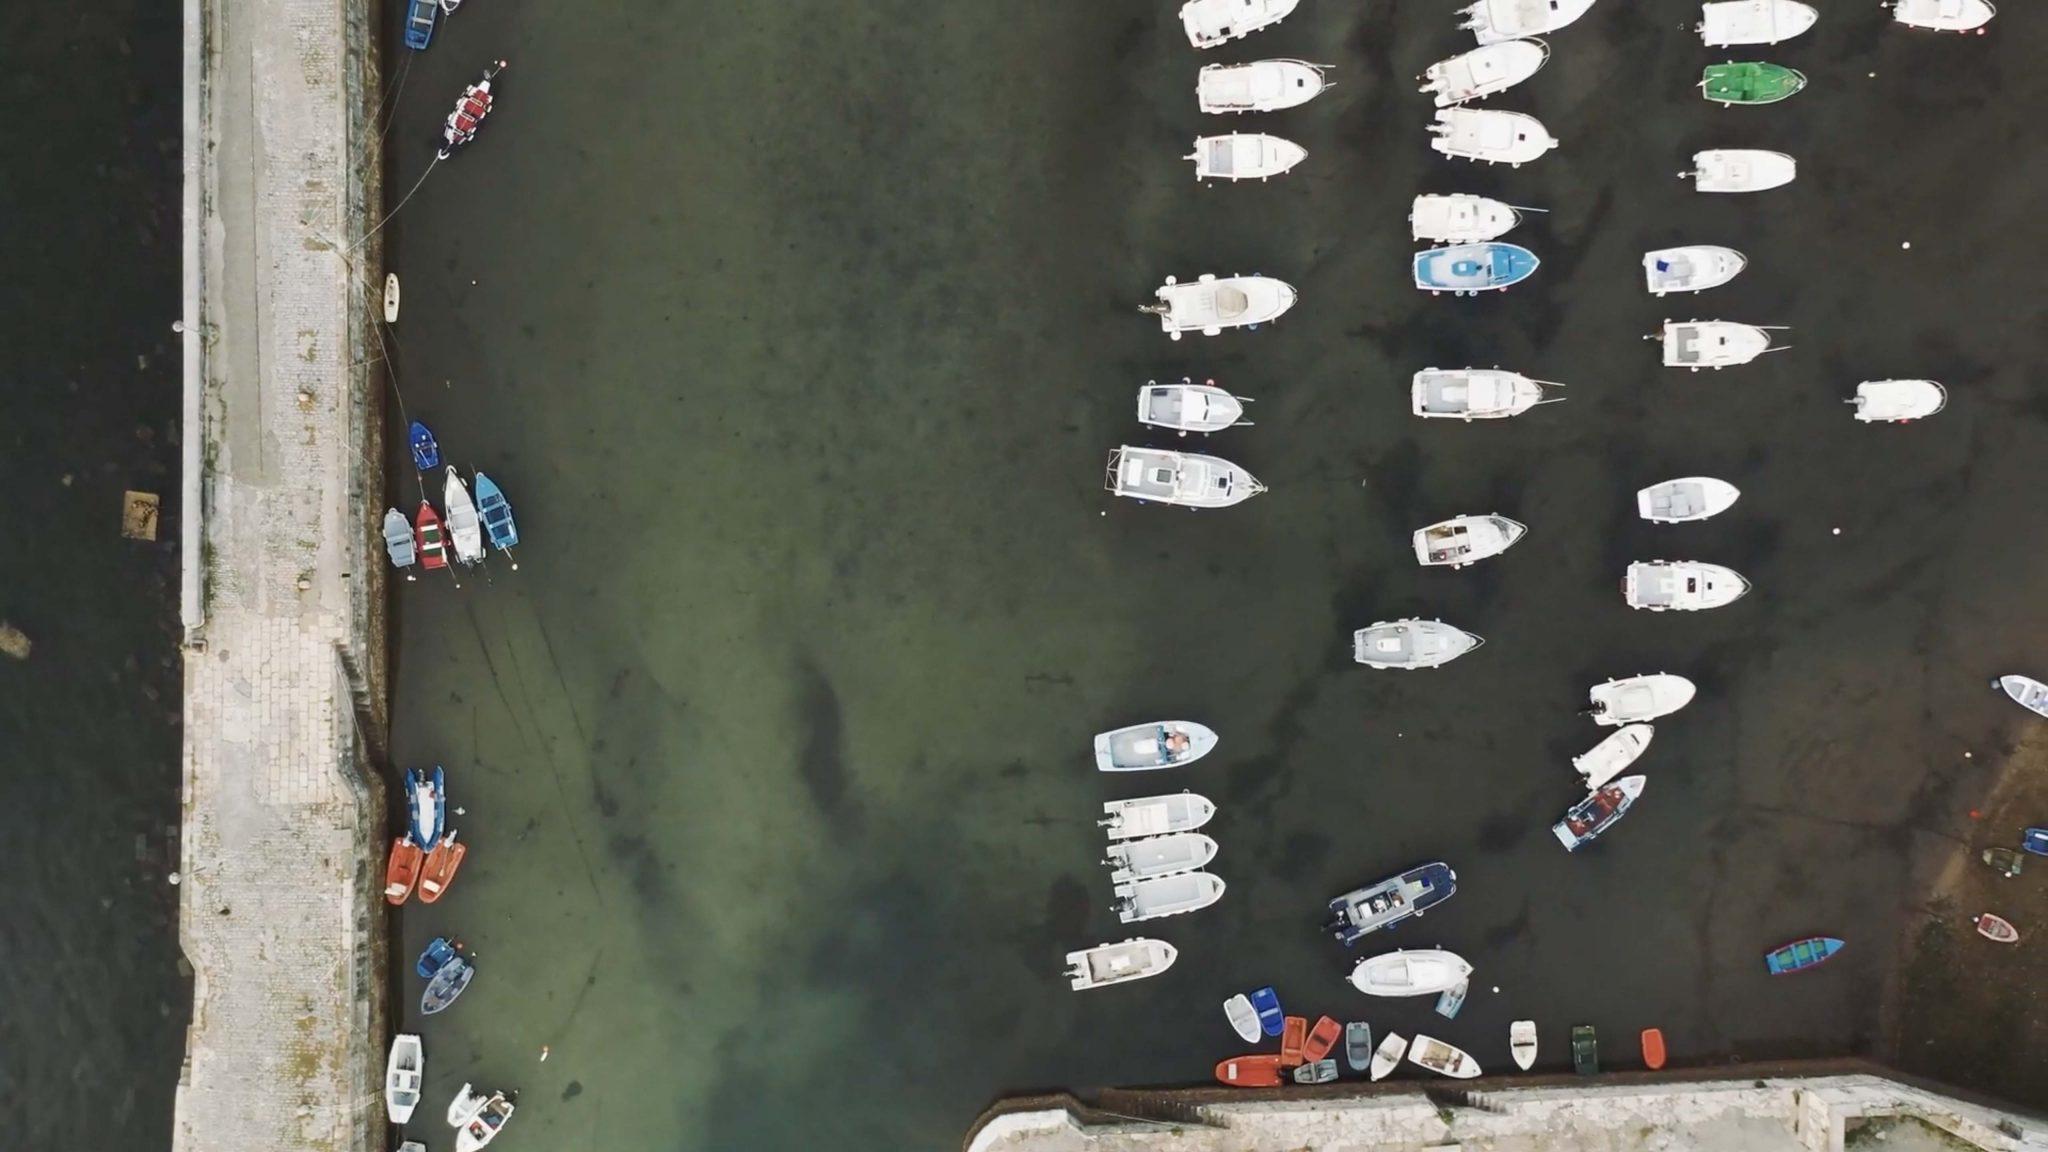 drone-bateaux-mringalss-films-pierre-frechou-bayonne-anglet-biarritz